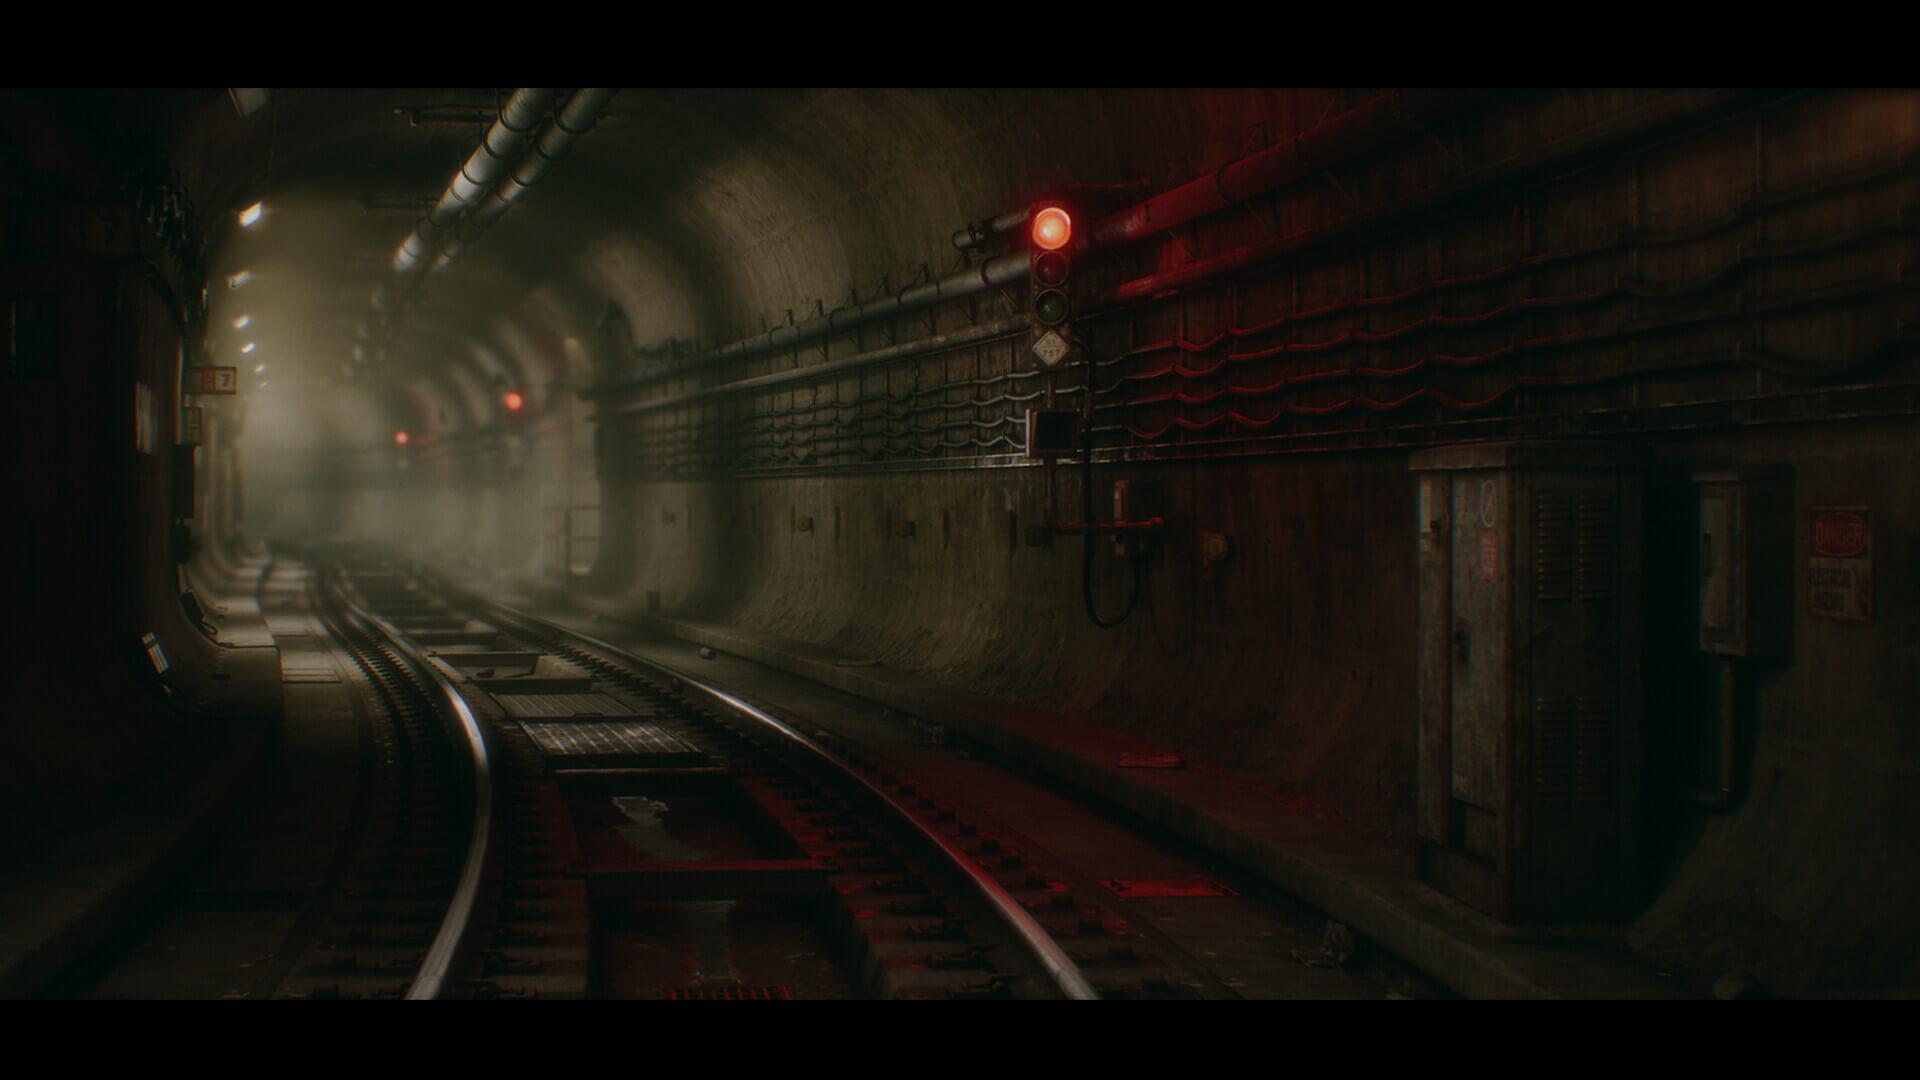 dekogon studios subwaytunnel screenshot01 - 【画像】『PS5』世代のゲームはこんな感じのグラフィックになるらしい